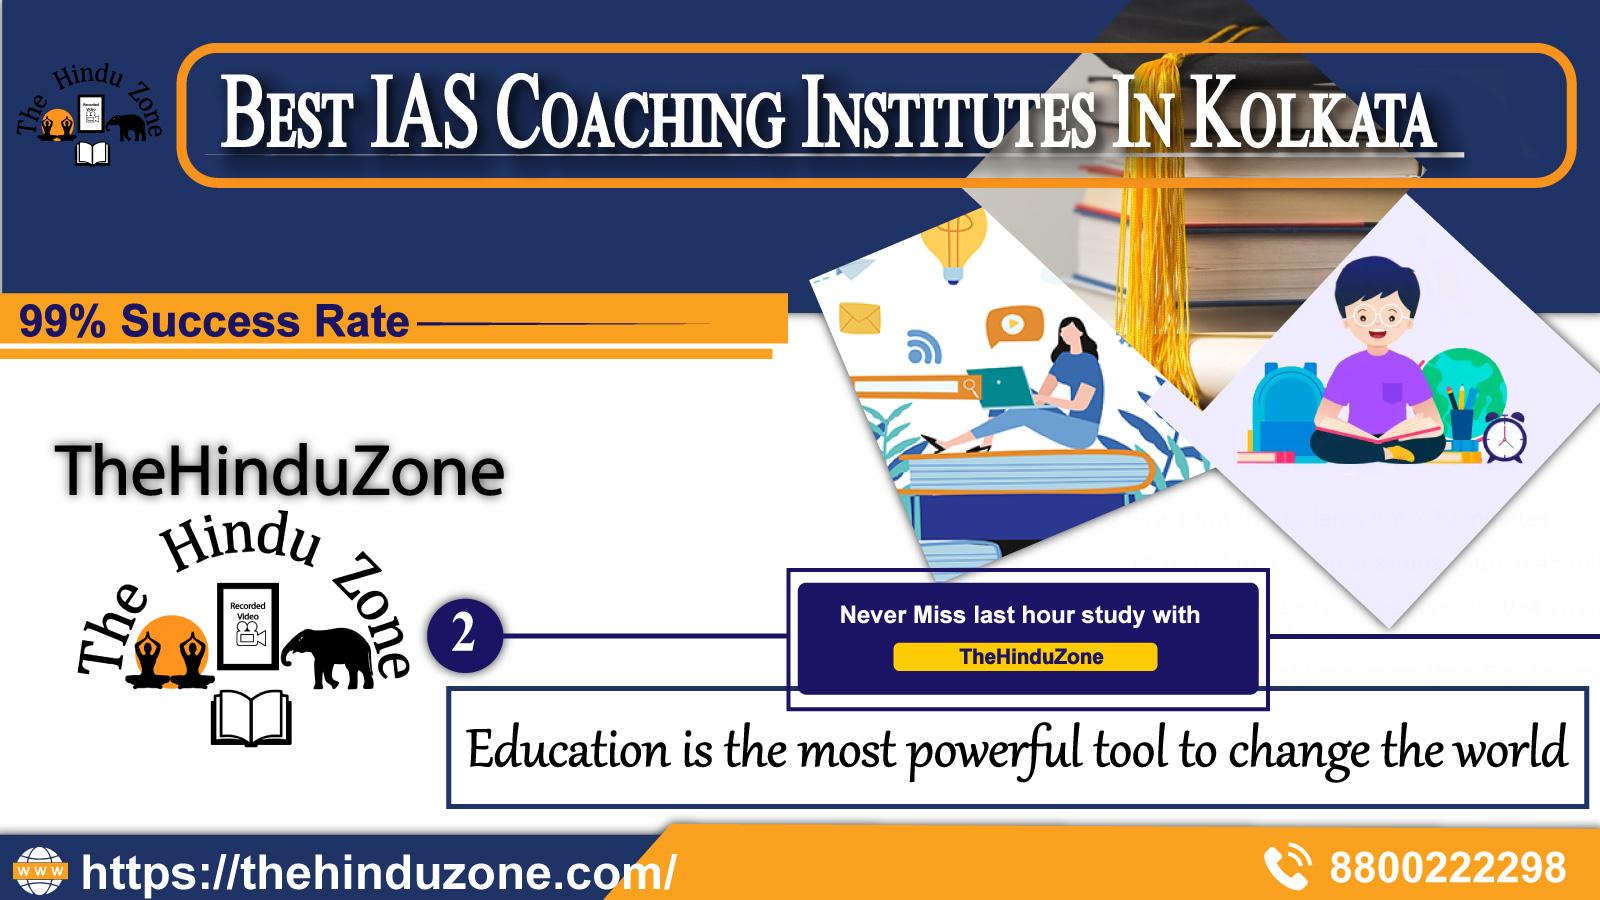 thehinduzone ias coaching In Kolkata